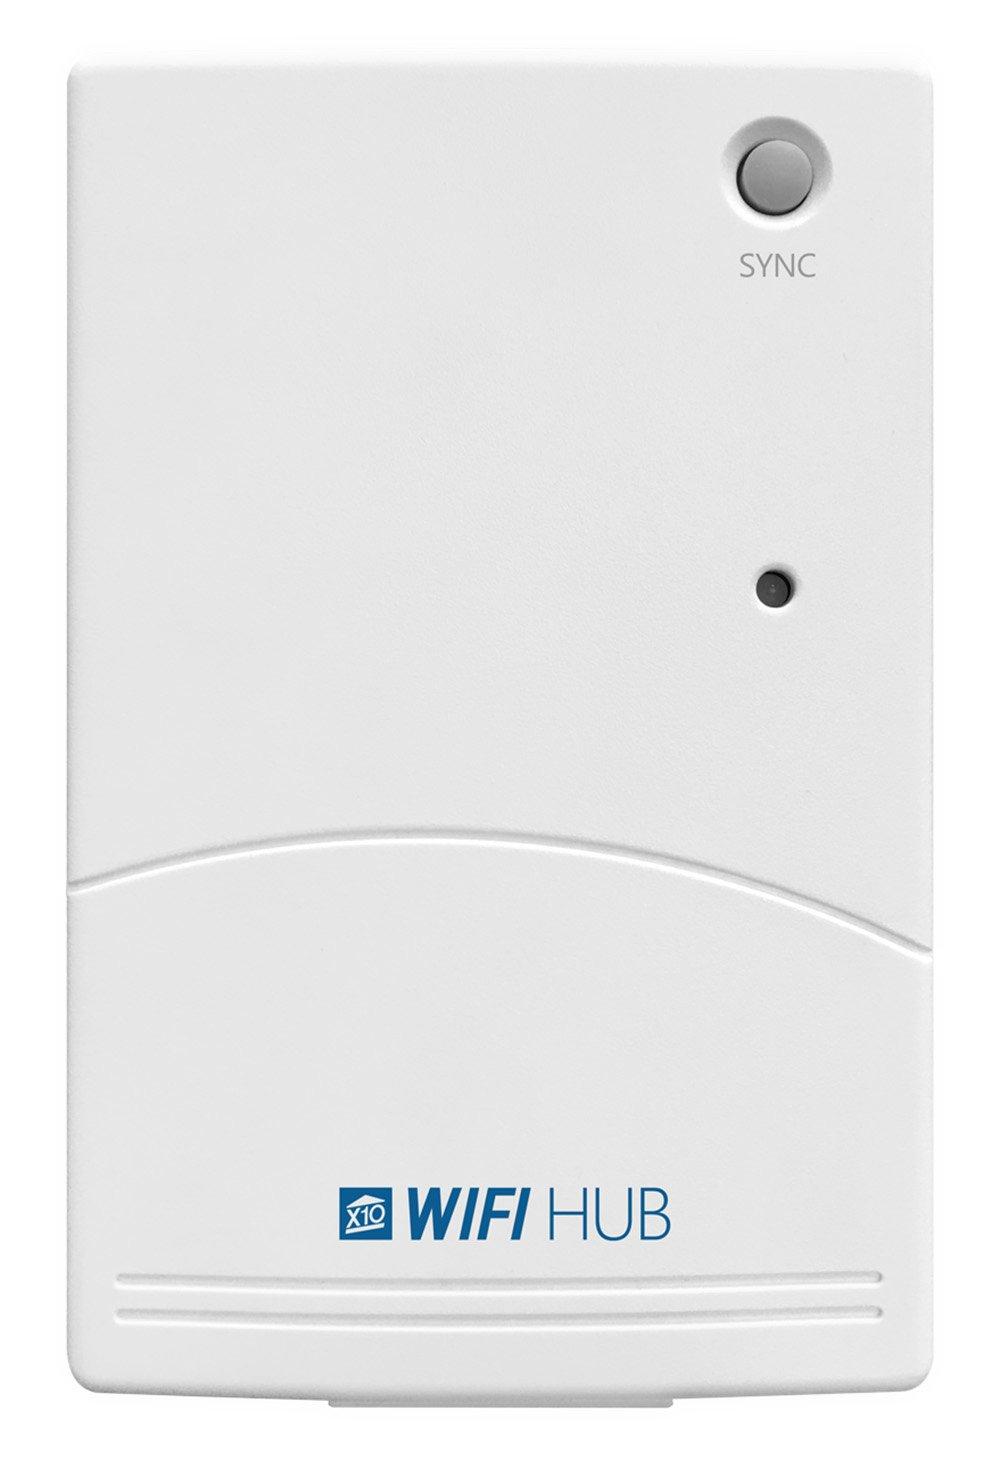 X10 WiFi Module - WM100